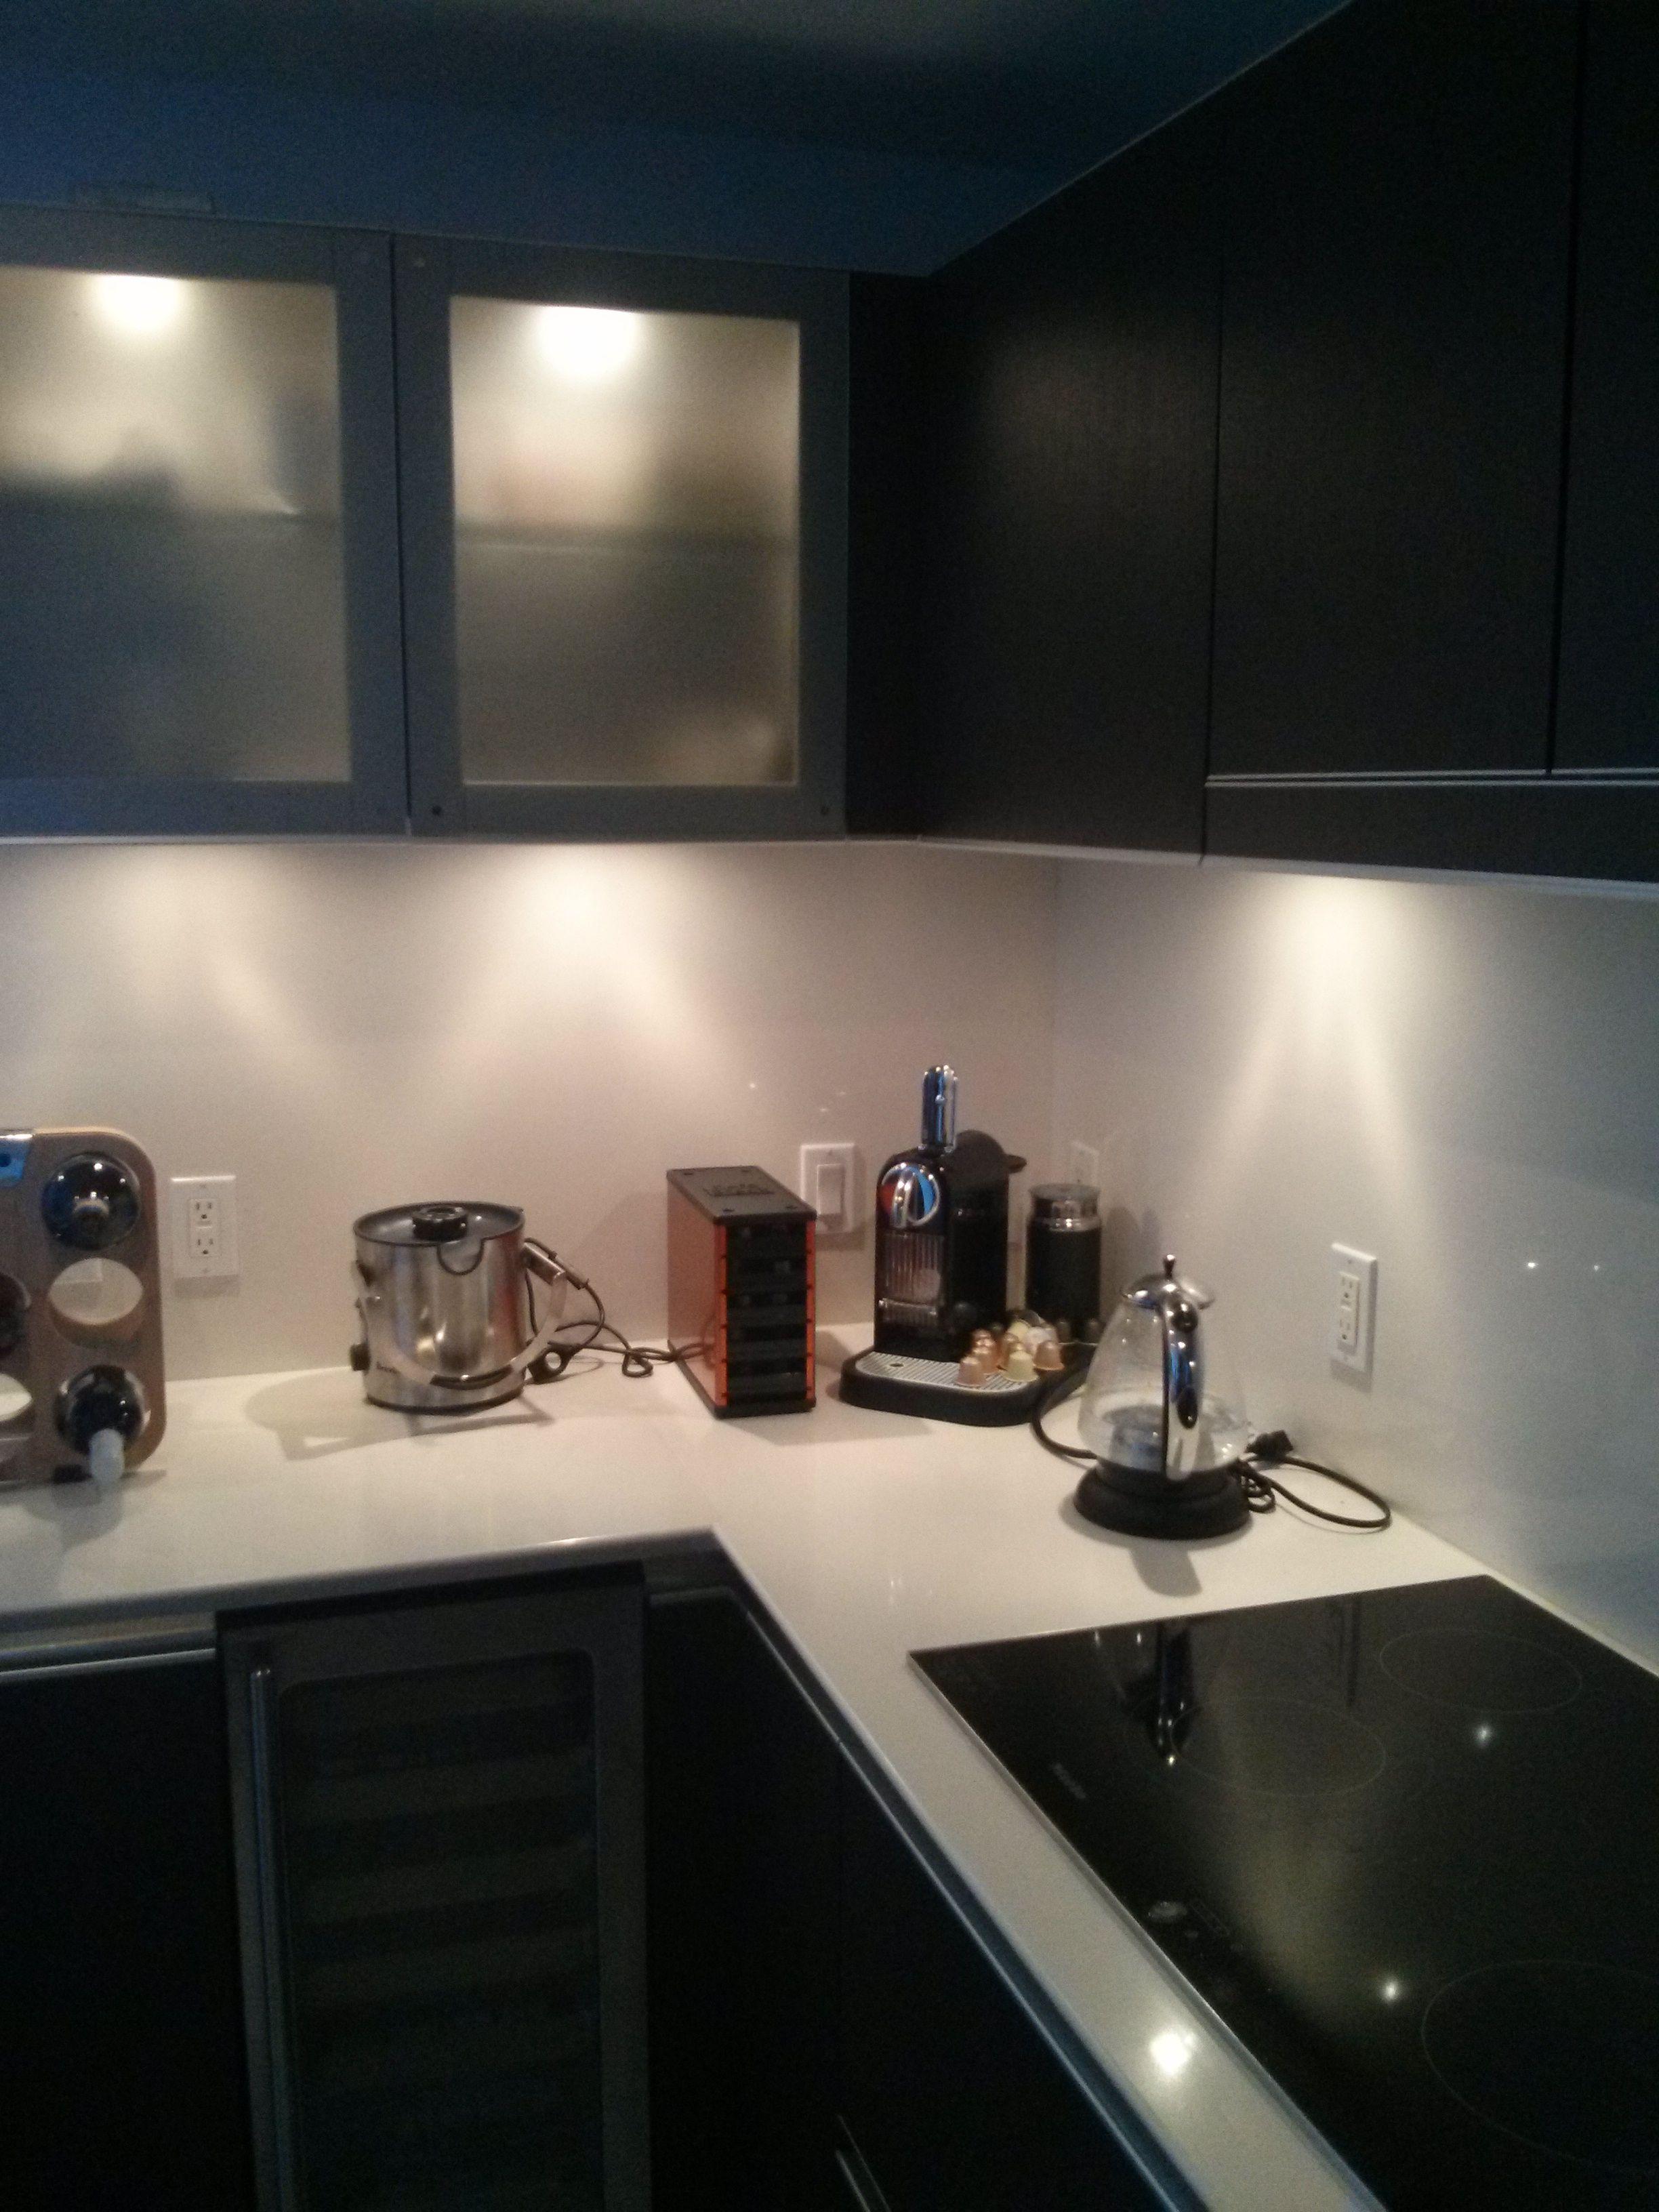 #kitchenremodel #kitchenrenovation #kitchenremodelingideas #Modernkitchen #Coolkitchen